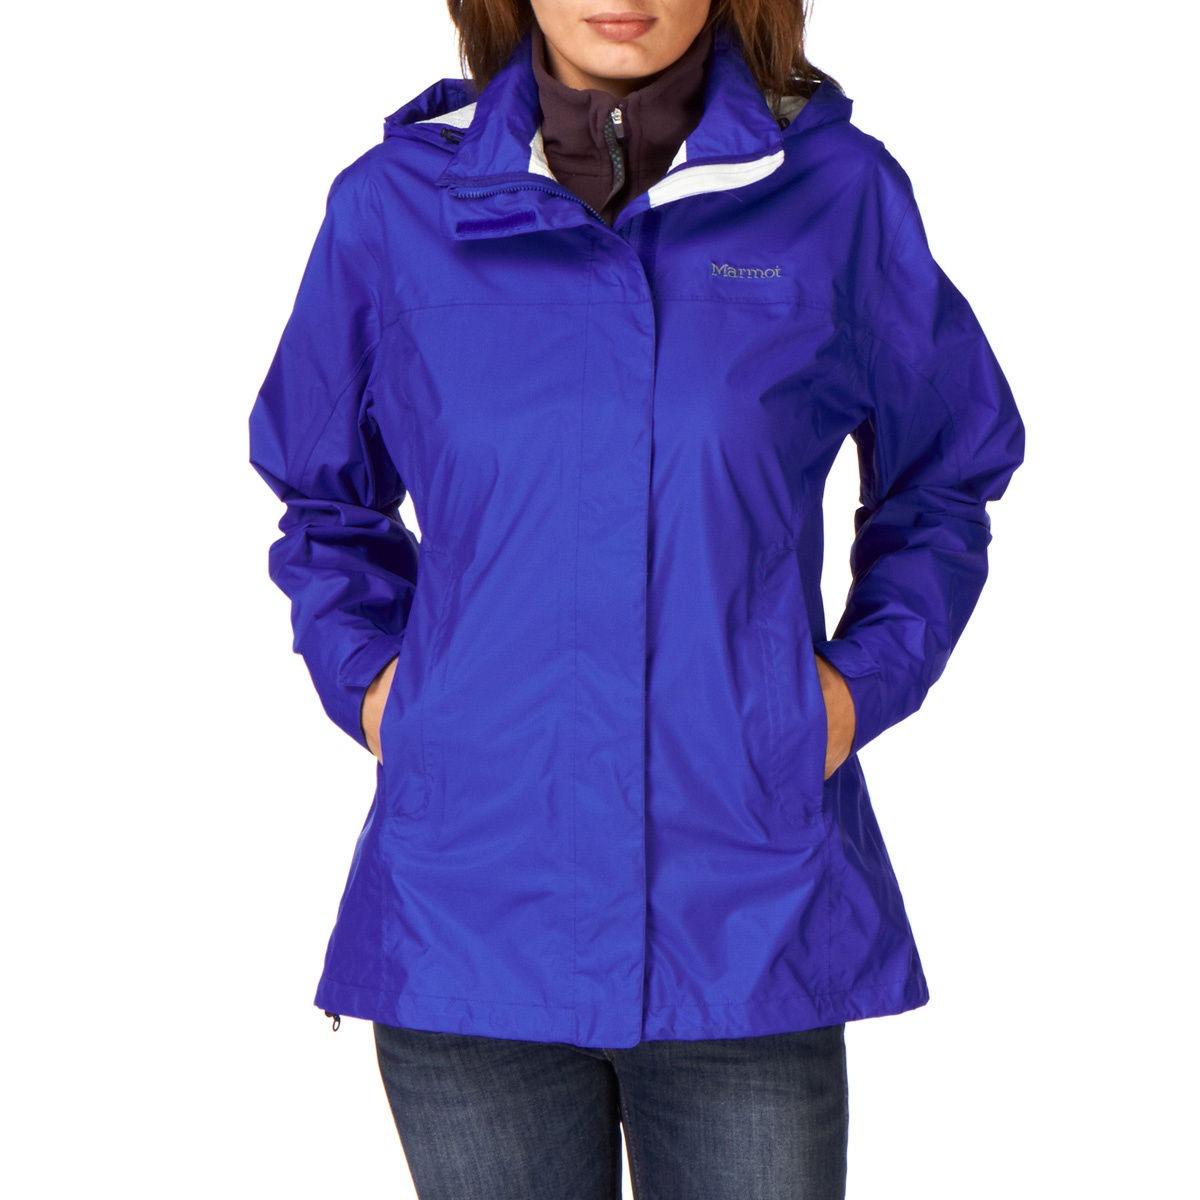 Marmot Women's Precip Jacket